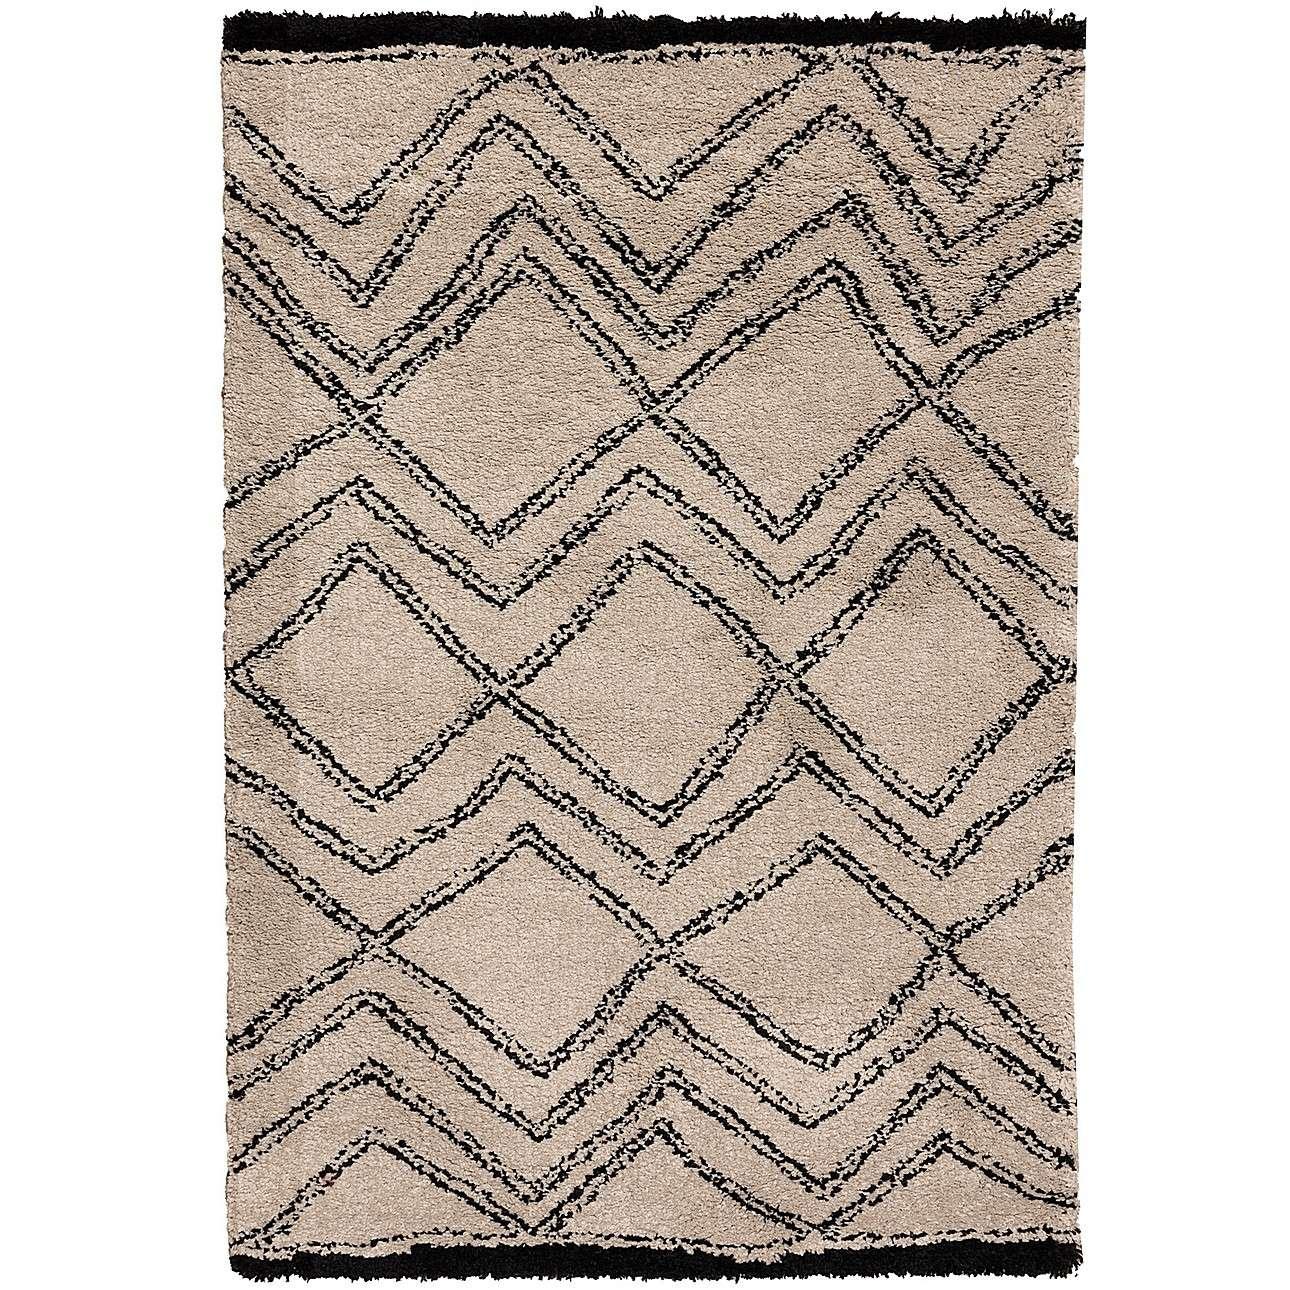 Teppich Royal Nomadic Living sand/black 120x170cm